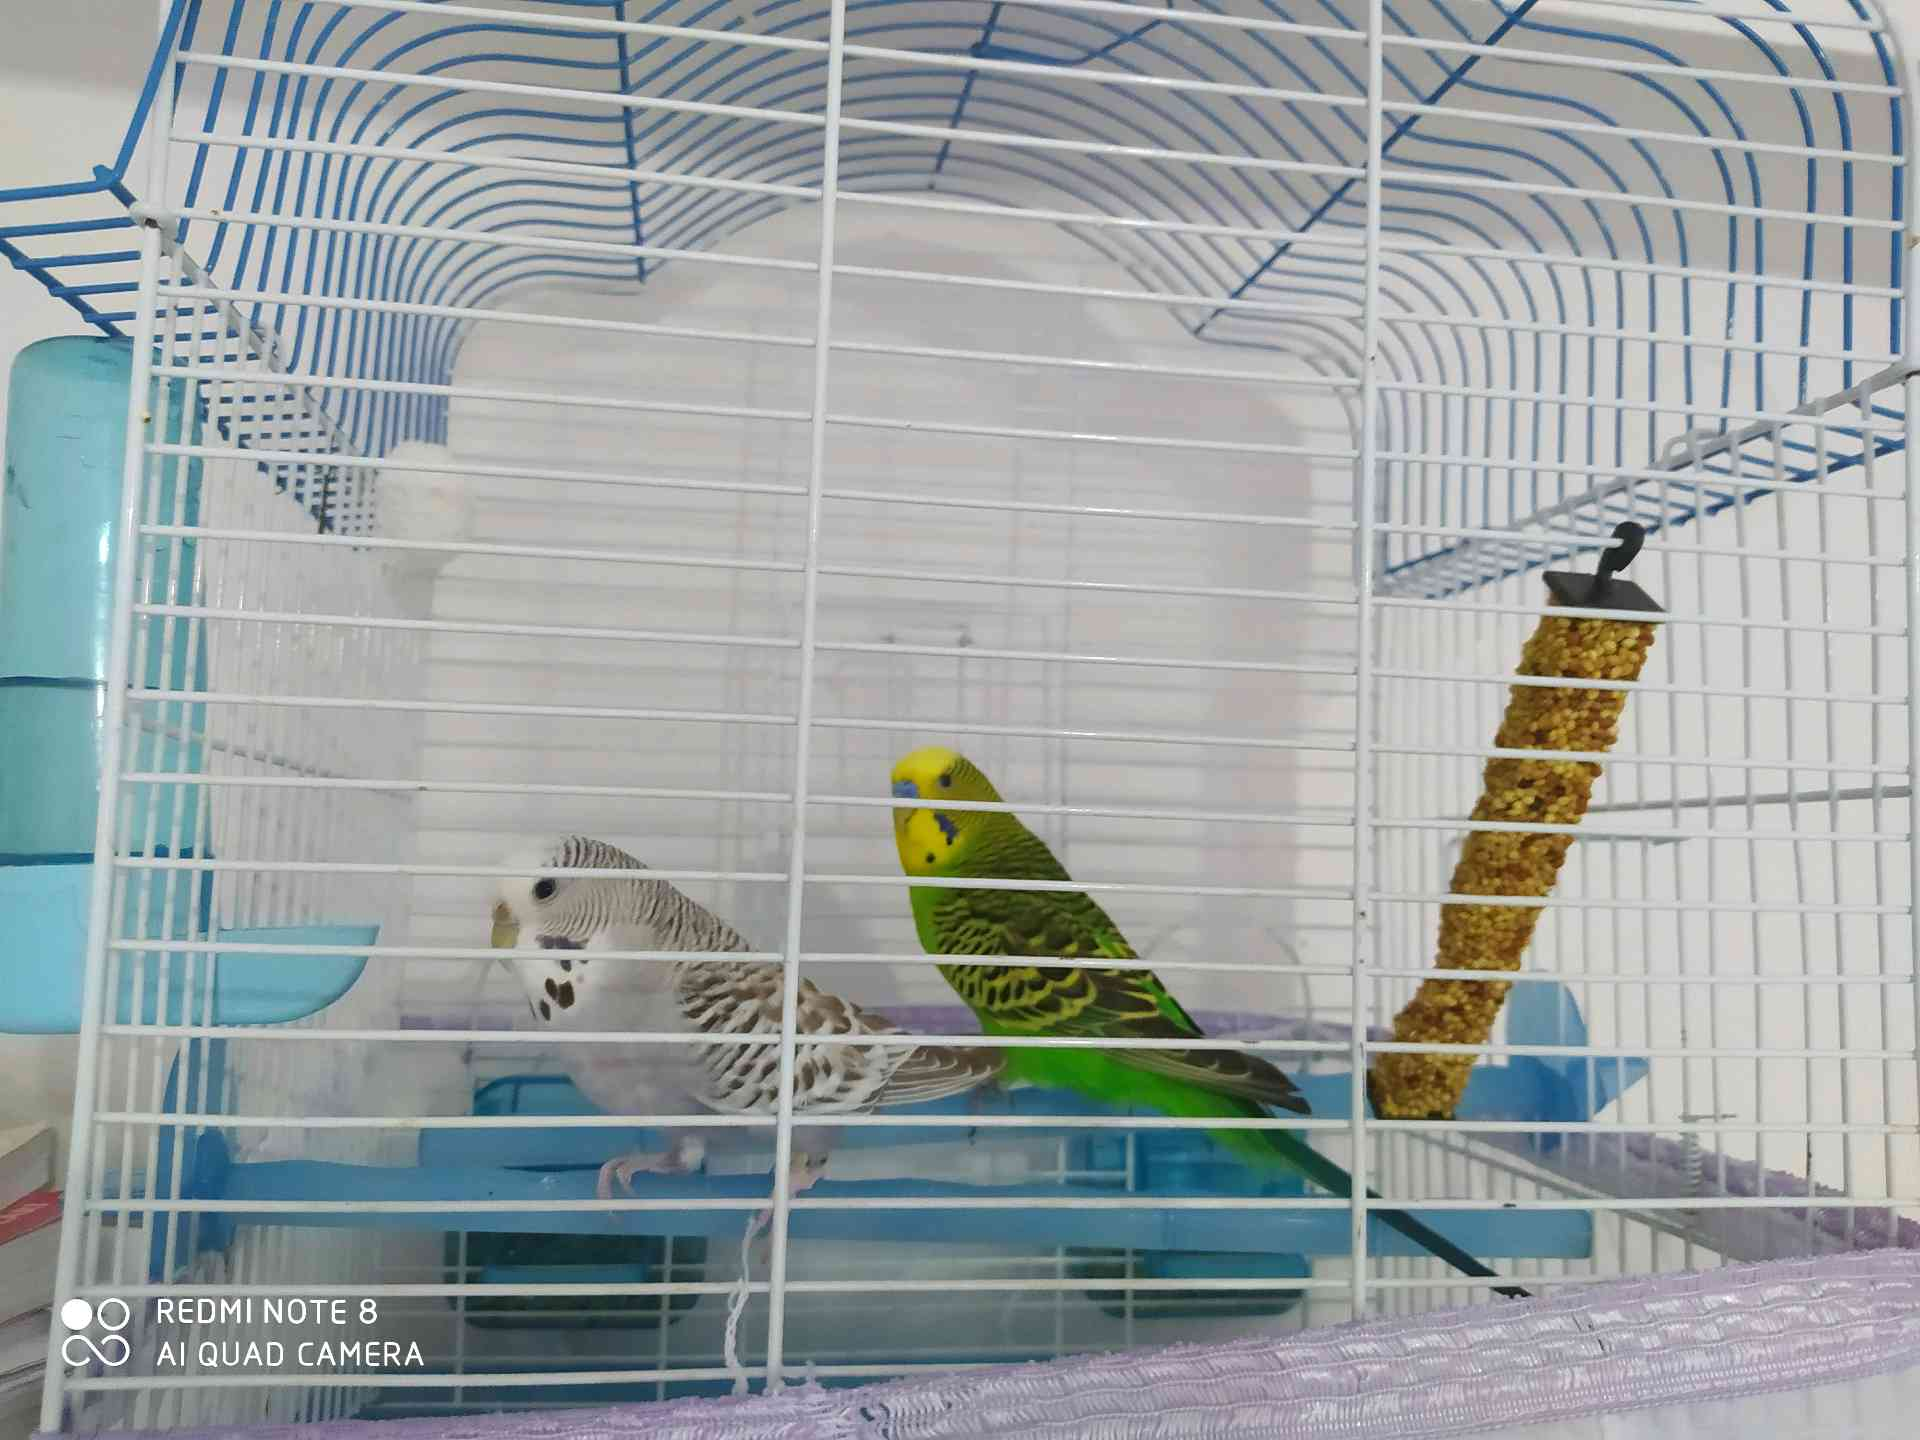 yeşil muhabbet kuşum kayboldu